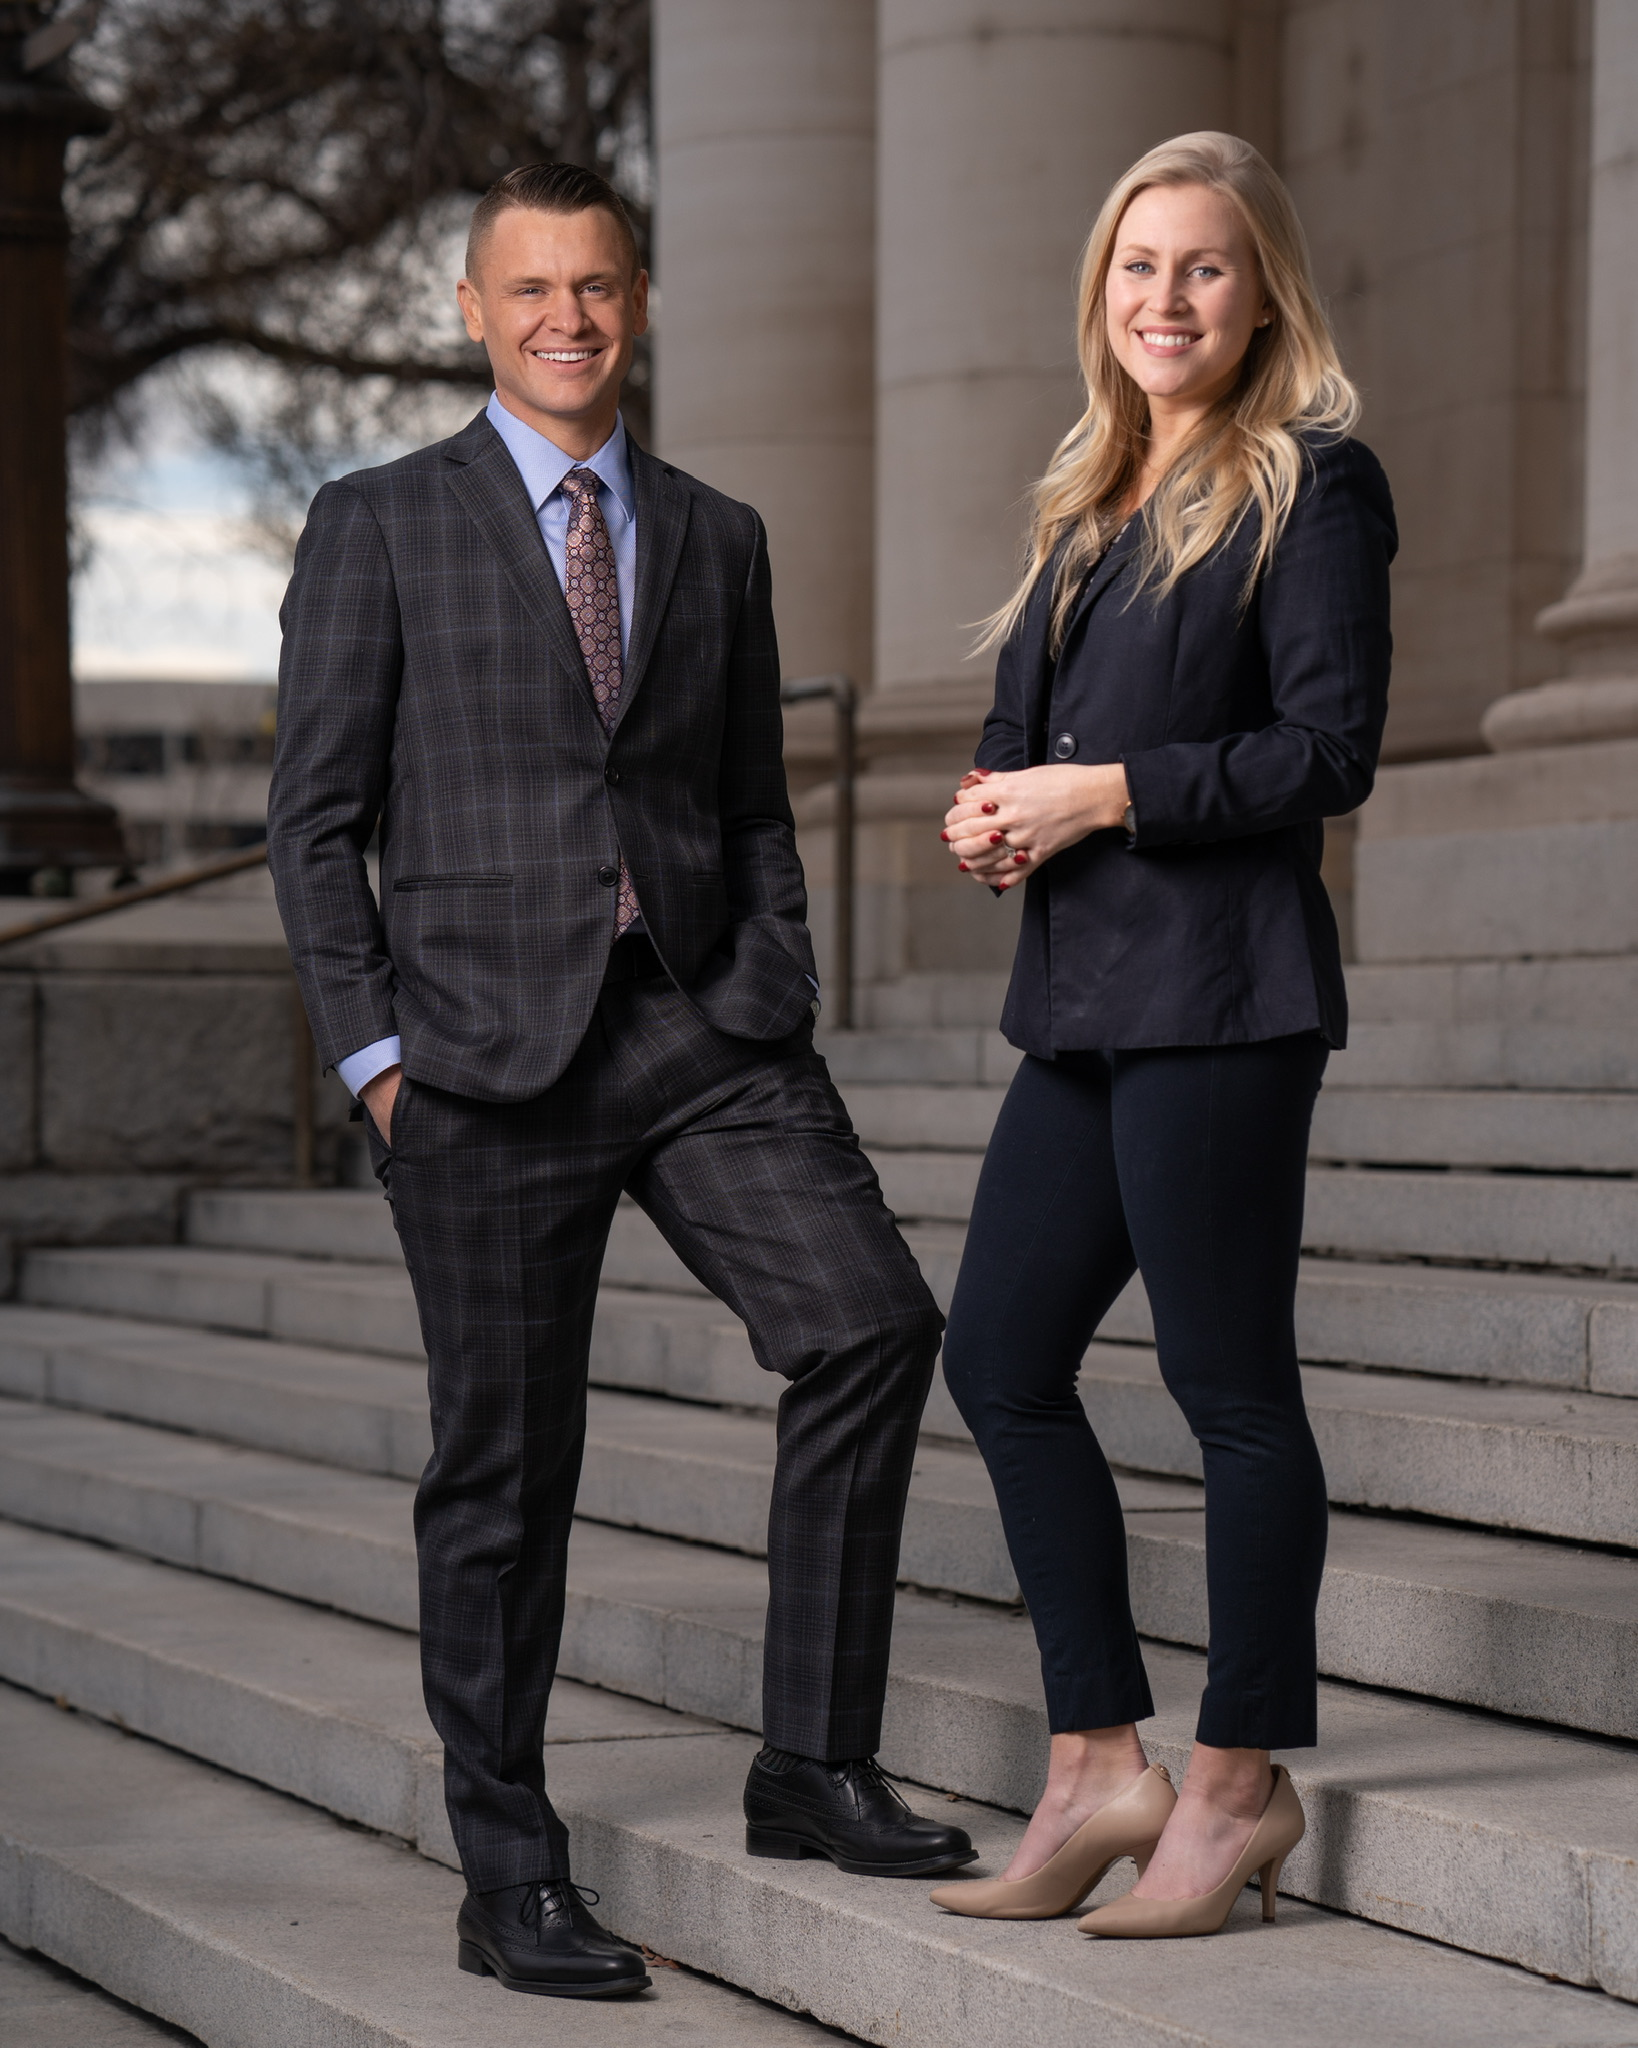 Mathew Work and Rebeca J. Carlson - Reno Attorneys